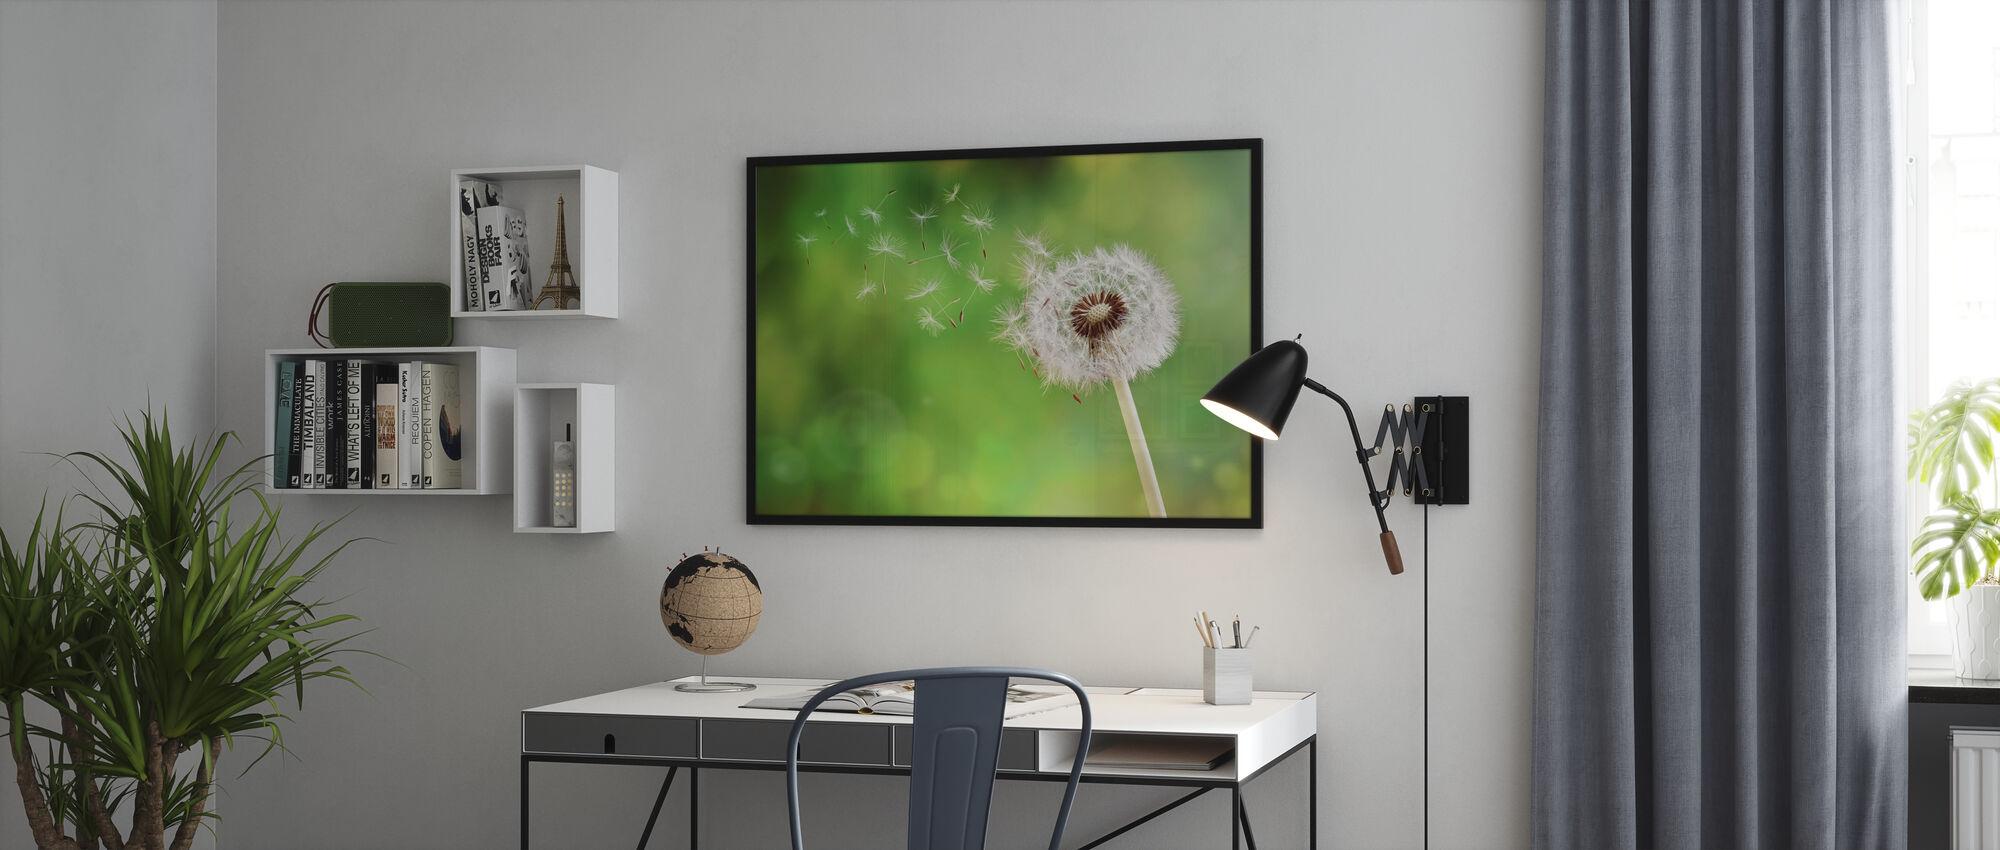 Dandelion Dispersing Seed - Poster - Office